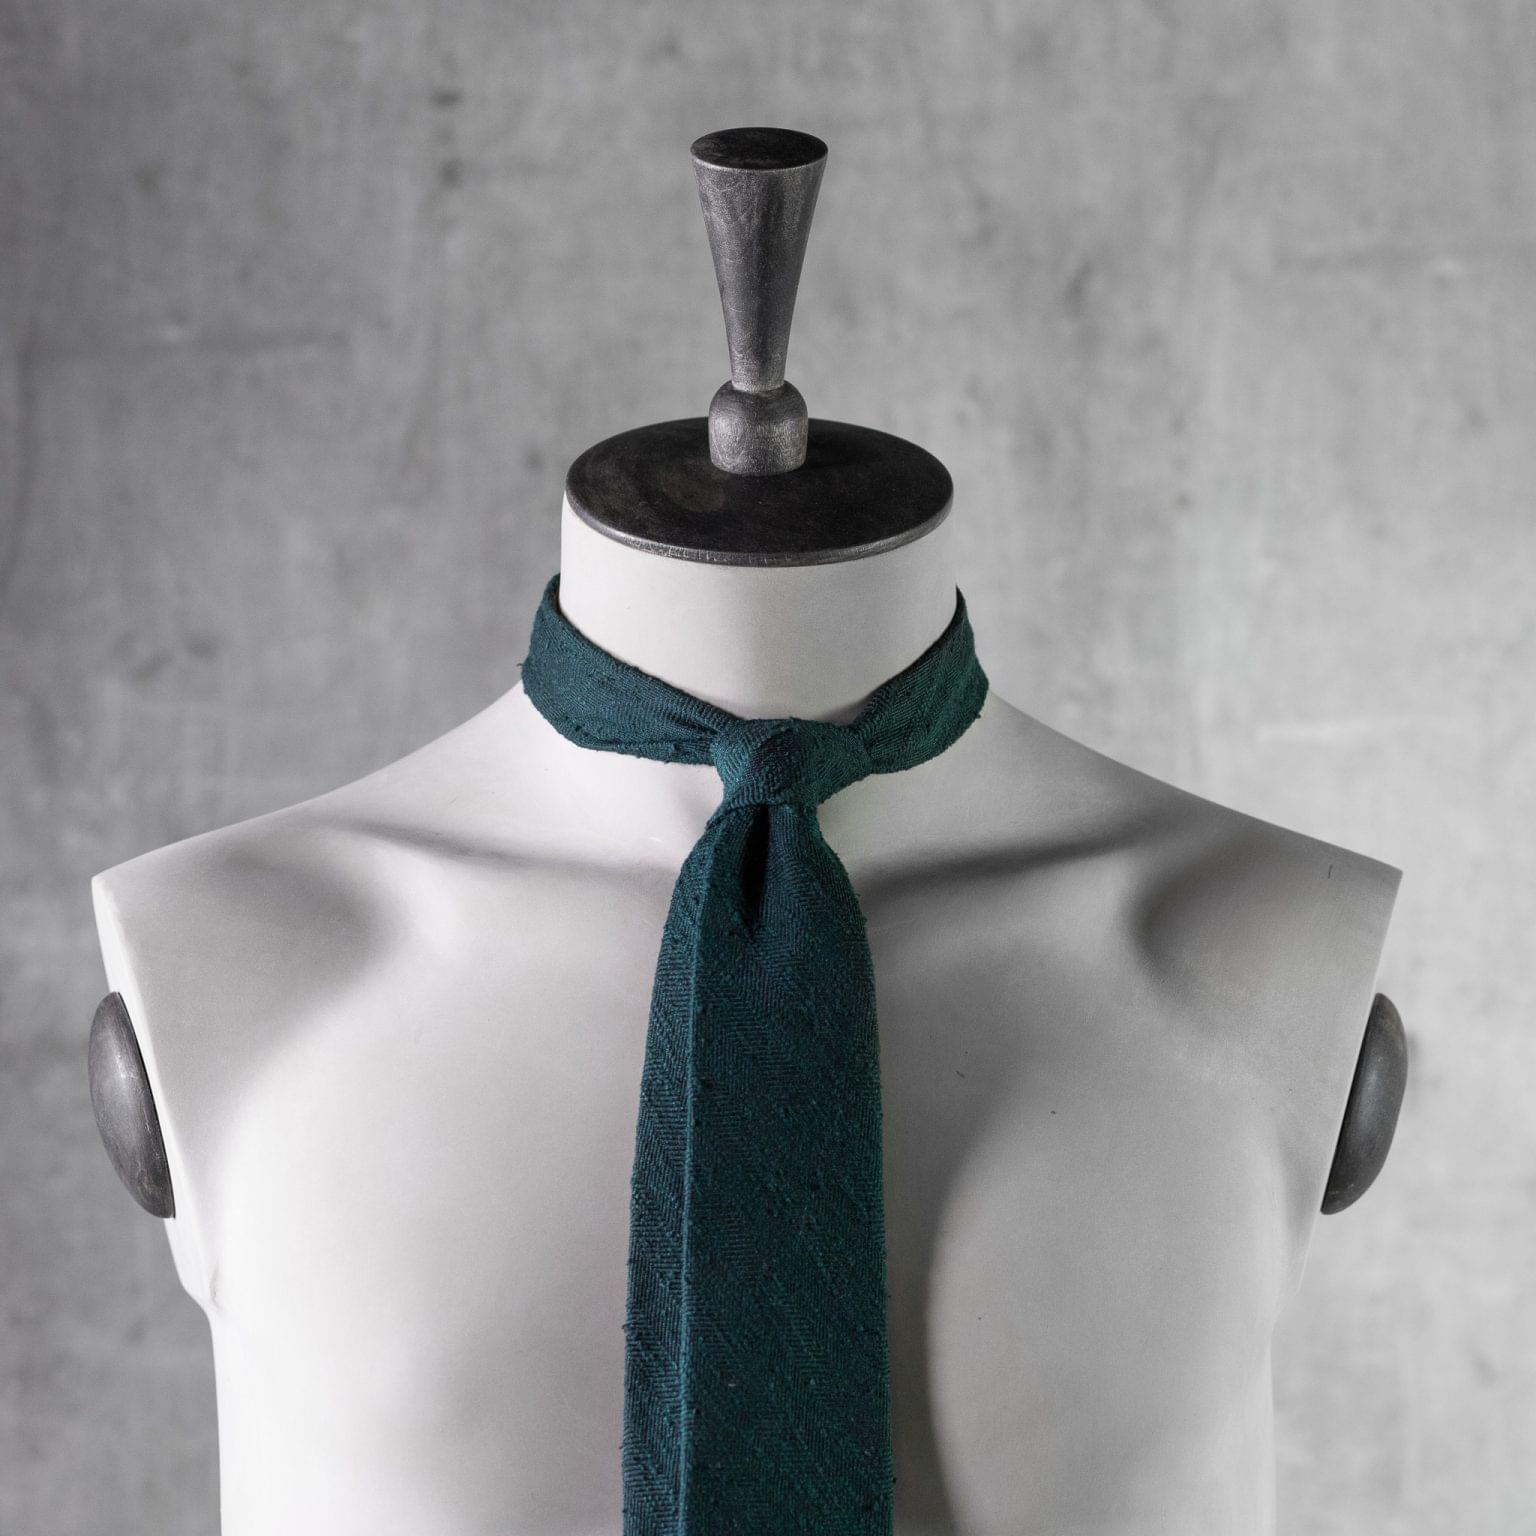 SHANTUNG-0359-Tie-Initials-Corbata-Iniciales-The-Seelk-3